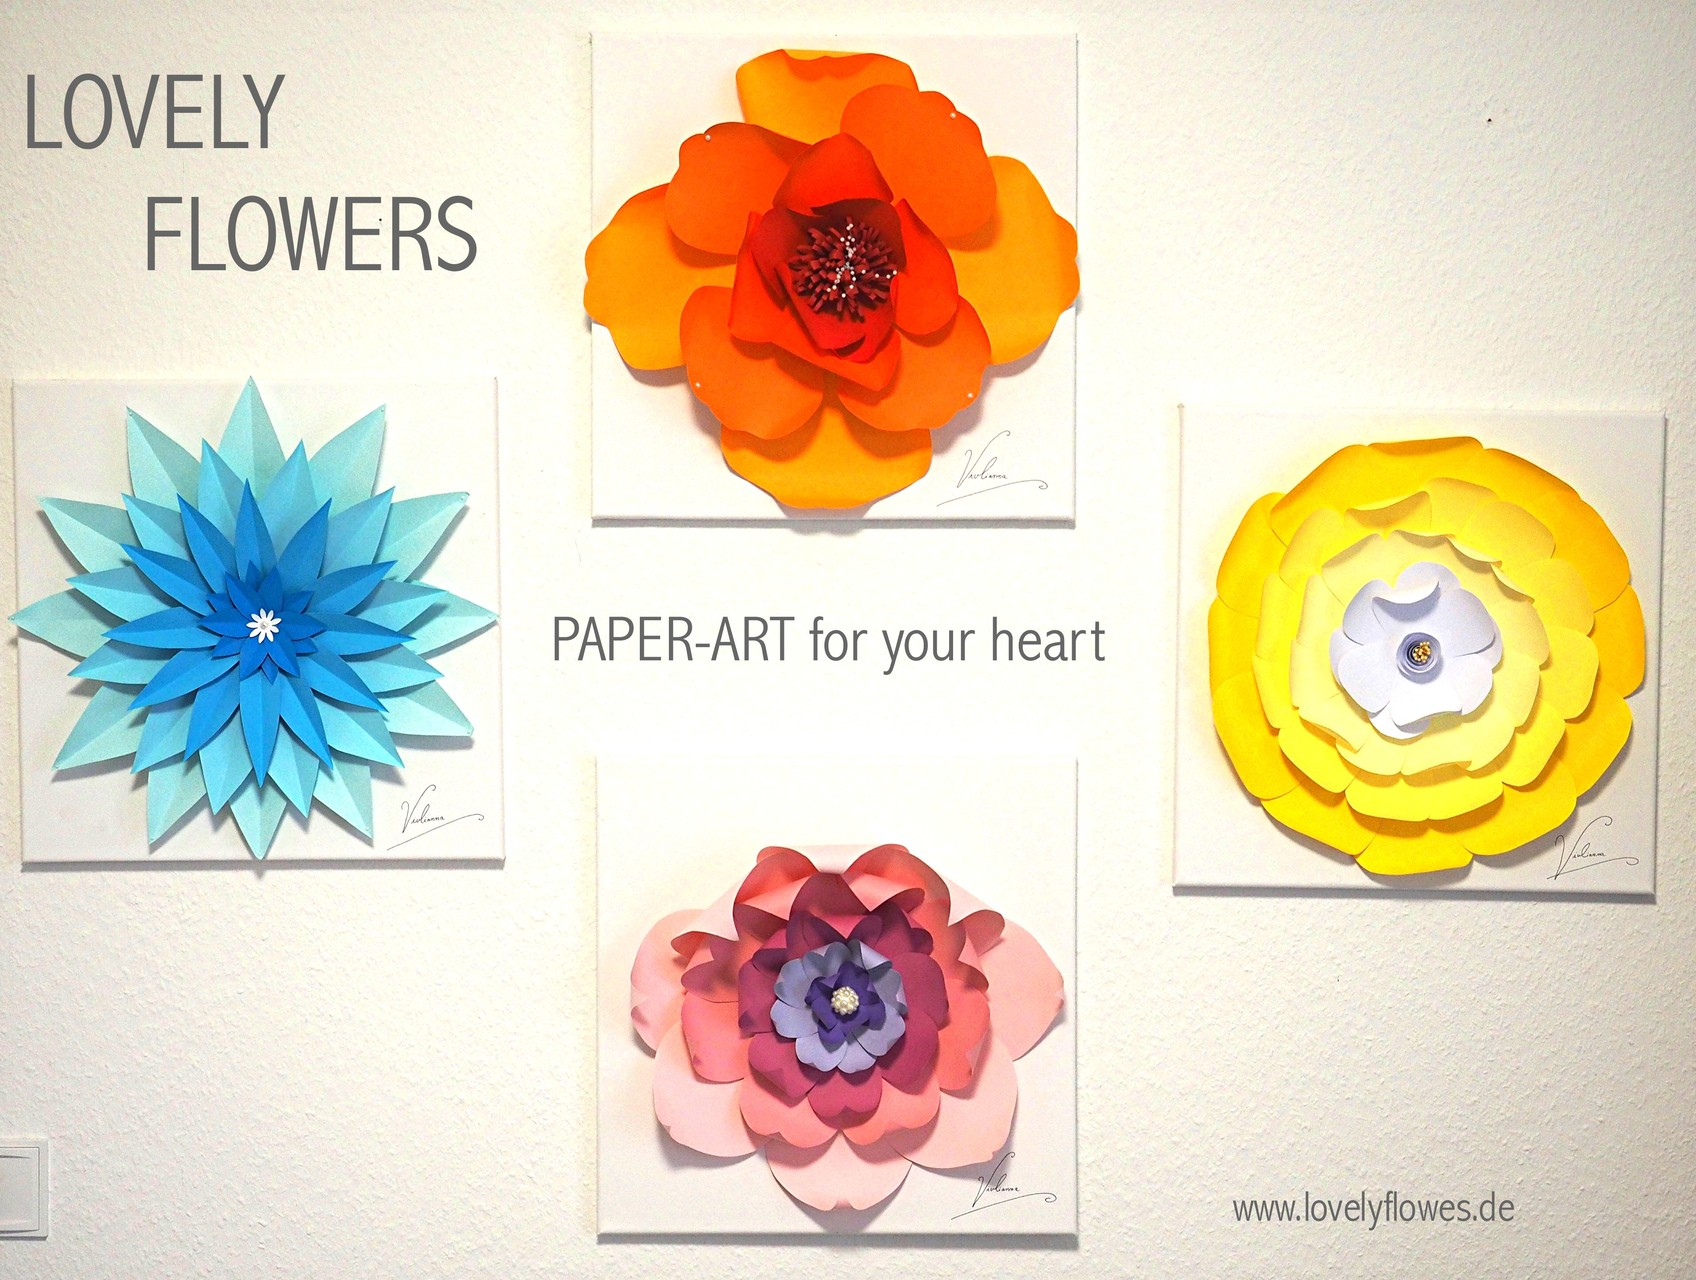 www.lovelyflowers.de - Dein Spezialist für PAPER-ART Wandbilddekorationen!